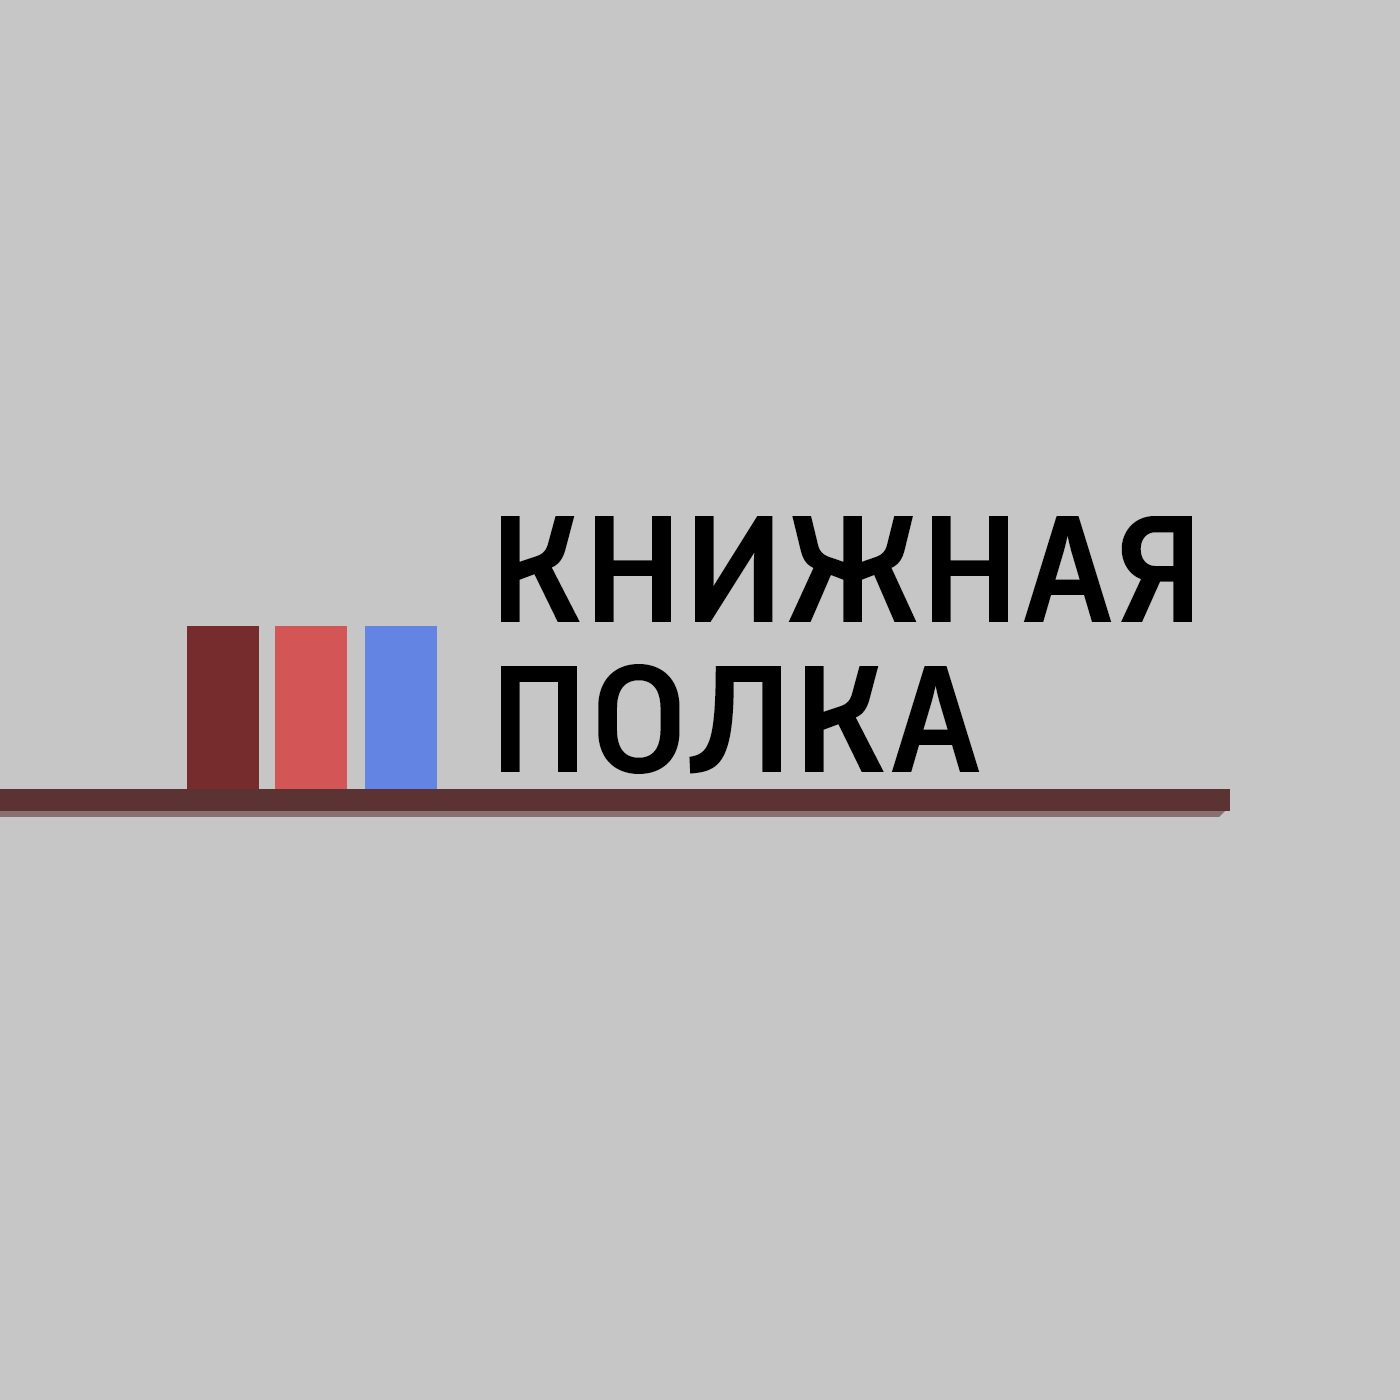 Маргарита Митрофанова Новинки литературы нон-фикшн книги альпина нон фикшн итальянцы